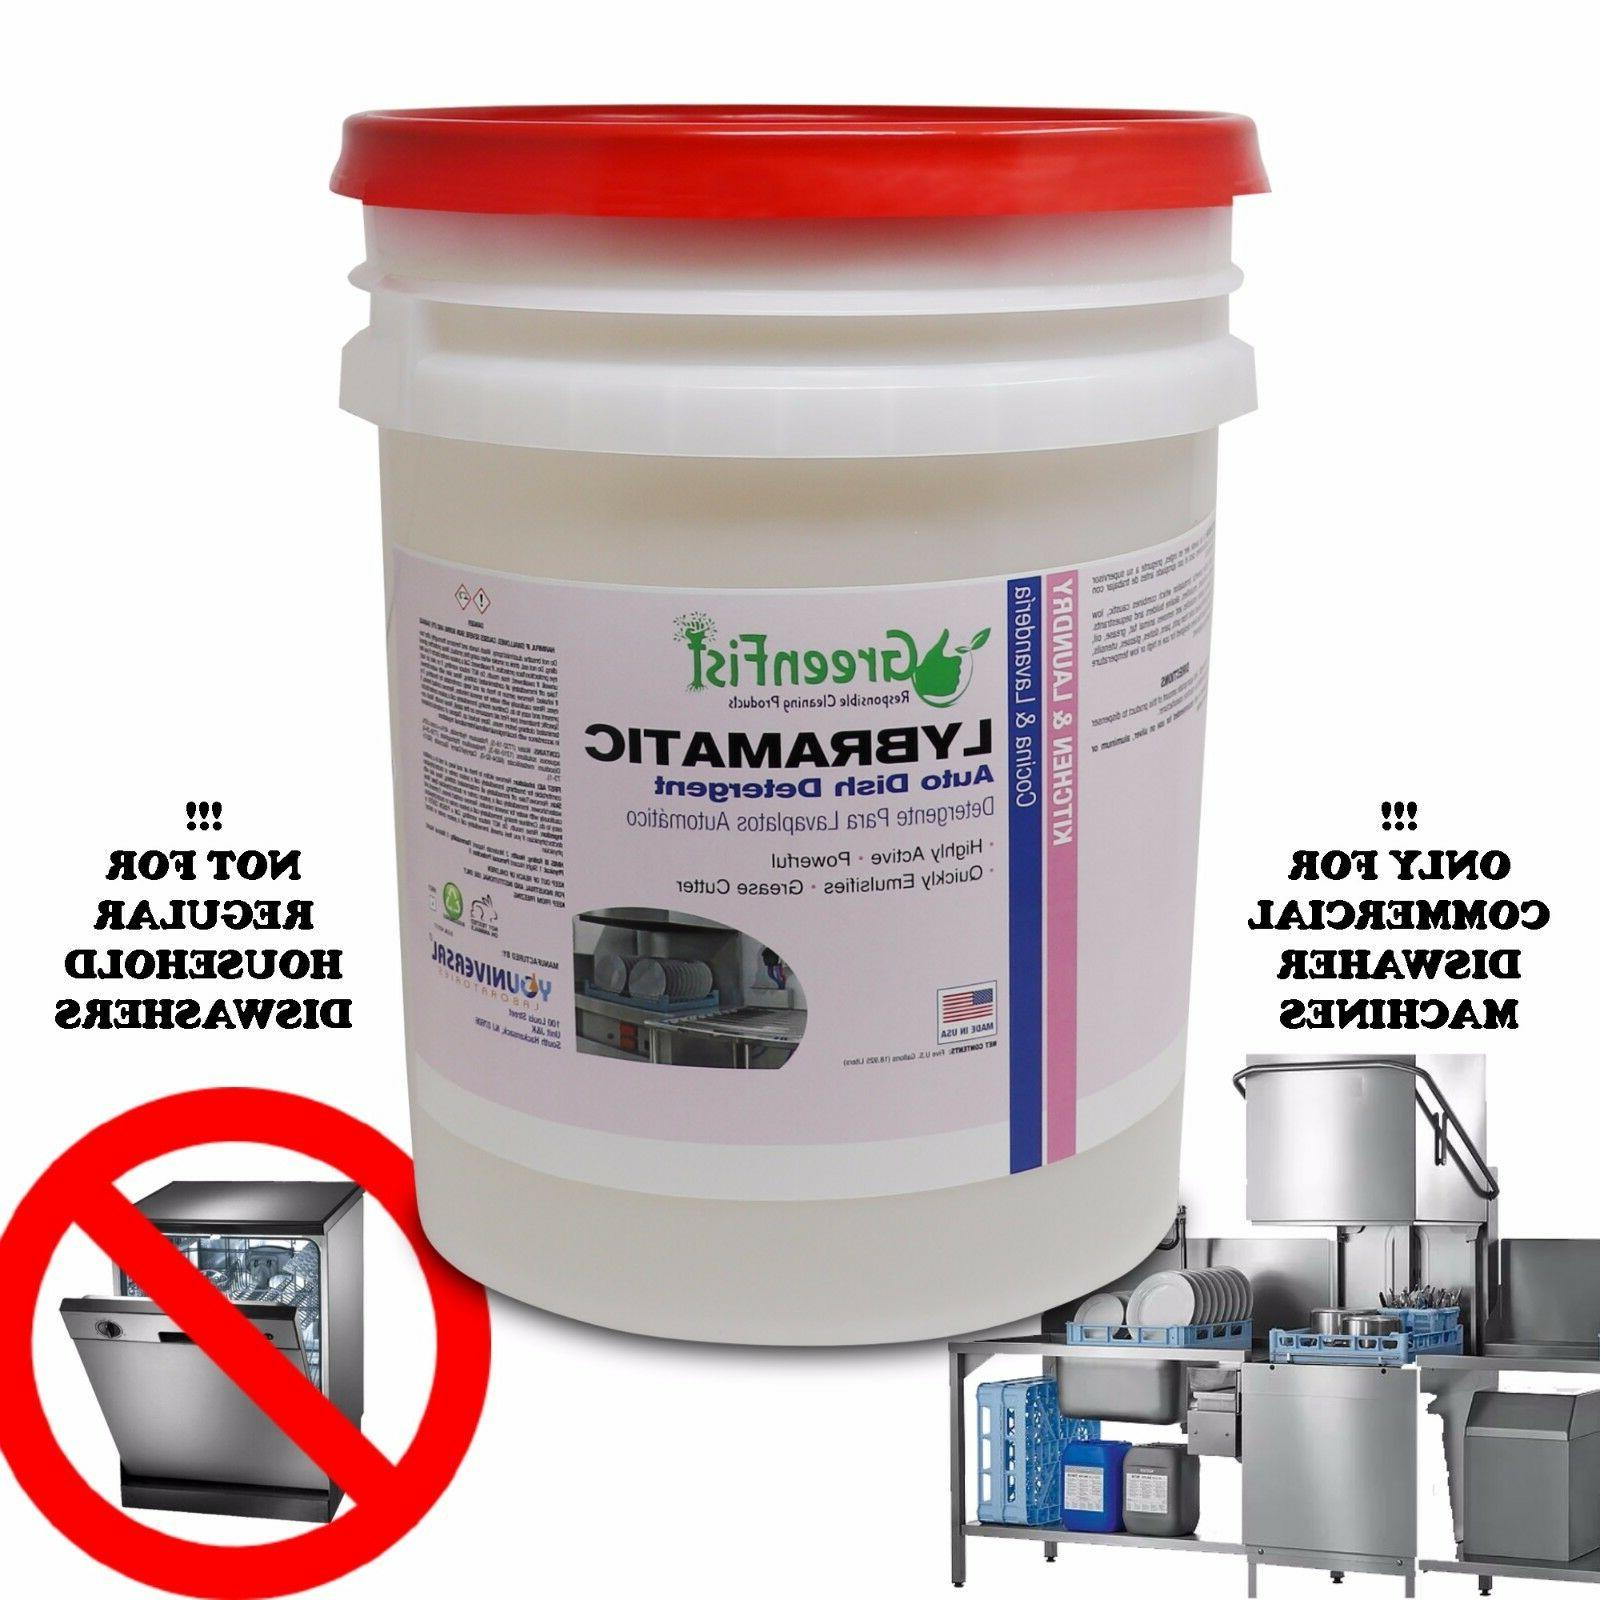 commercial industrial grade dishwasher detergent 5 gal